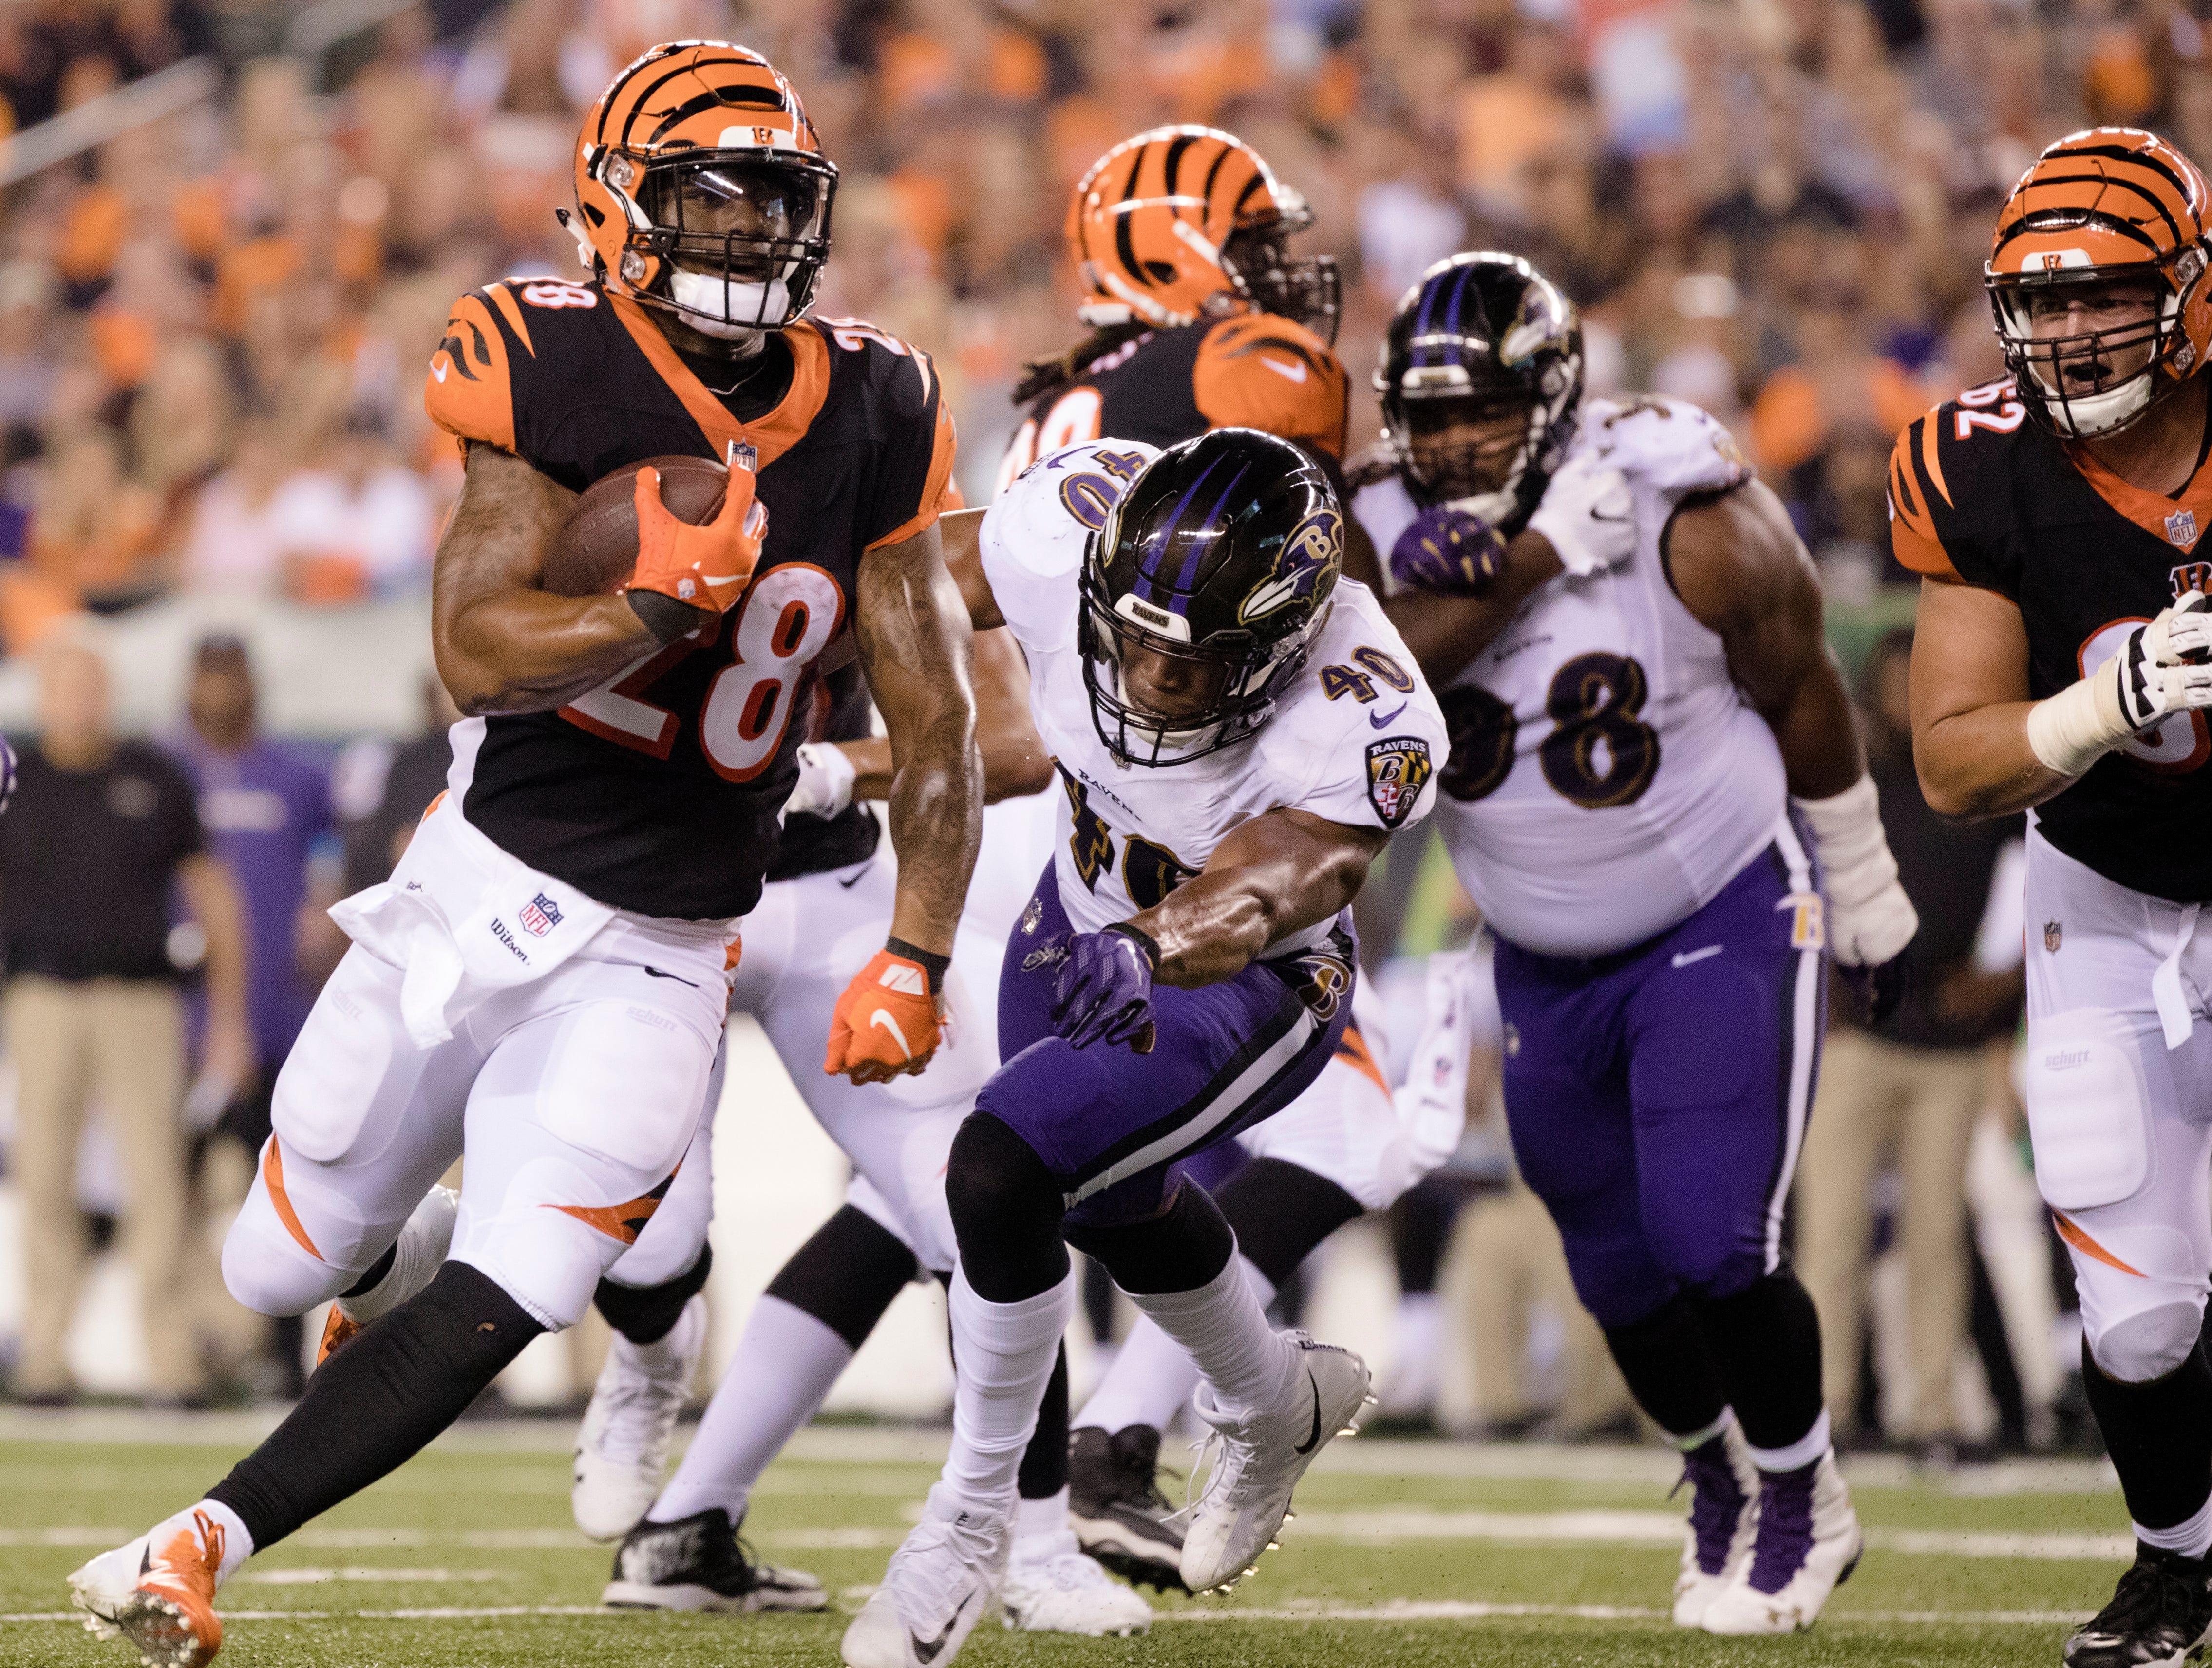 Cincinnati Bengals running back Joe Mixon (28) runs past Baltimore Ravens linebacker Kenny Young (40) during the Week 2 NFL game between the Cincinnati Bengals and the Baltimore Ravens, Thursday, Sept. 13, 2018, at Paul Brown Stadium in Cincinnati.